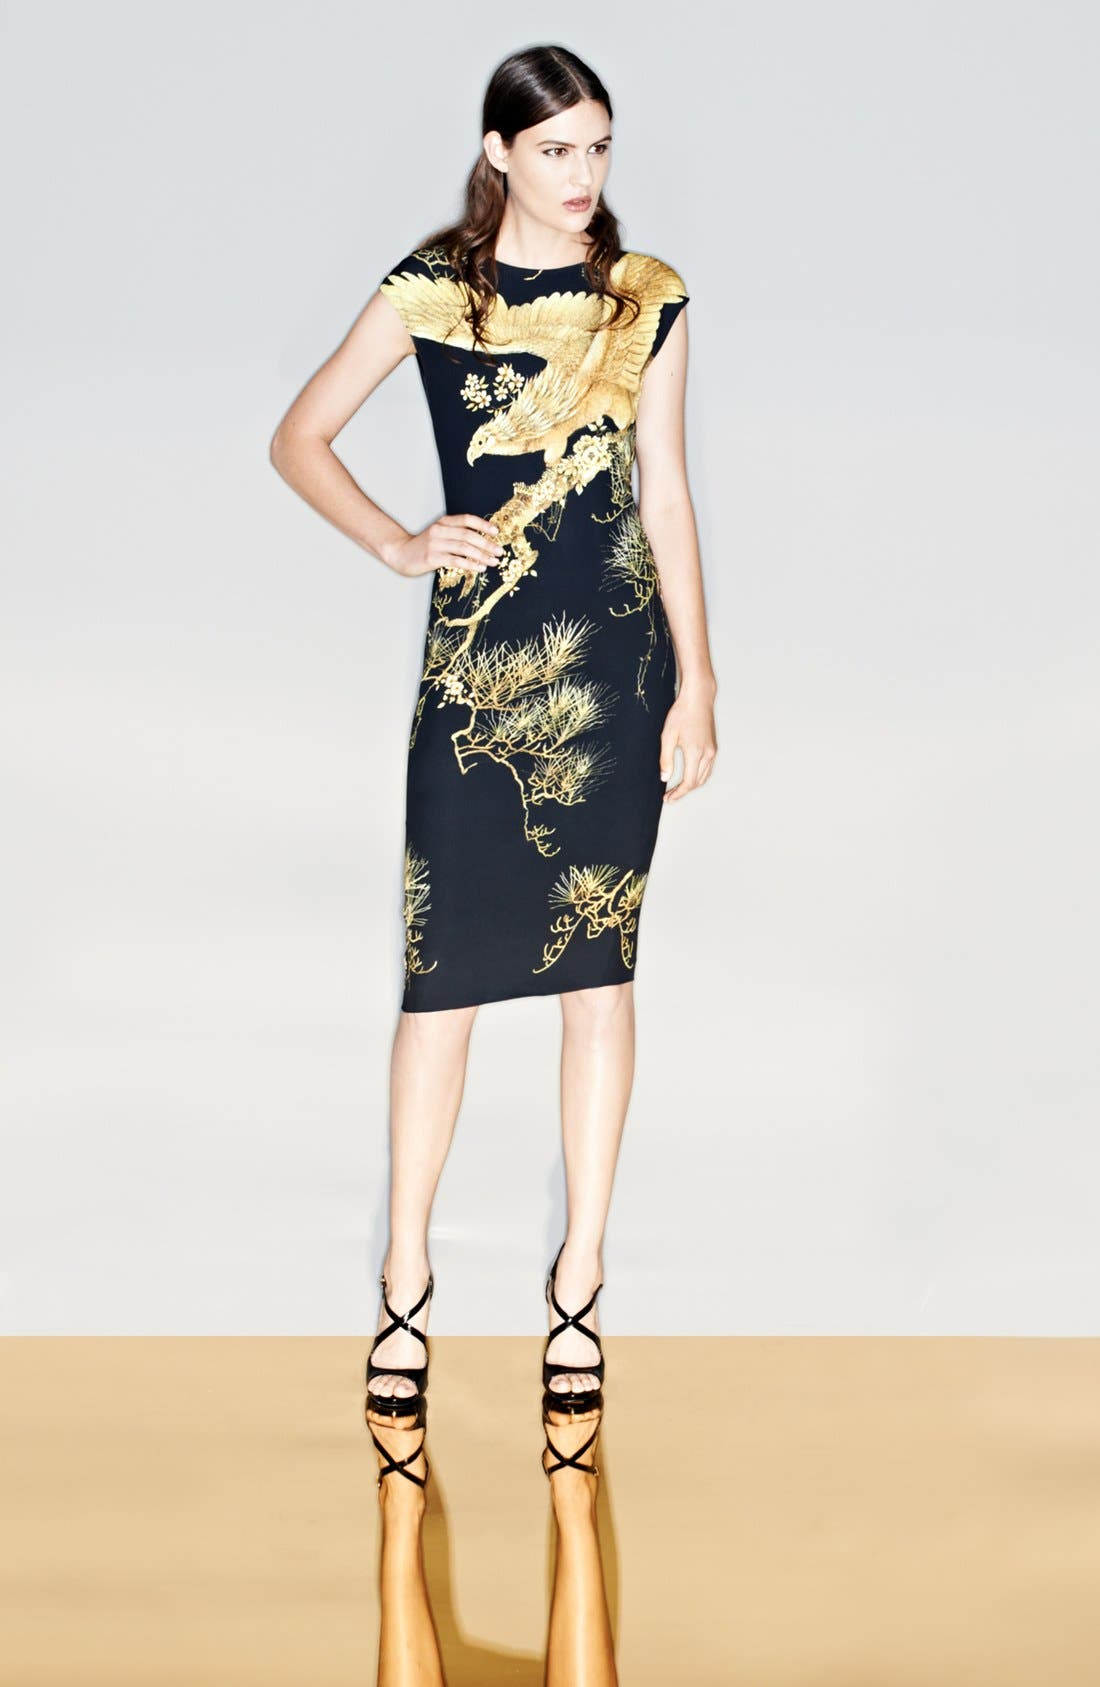 Main Image - Roberto Cavalli Dress & Accessories